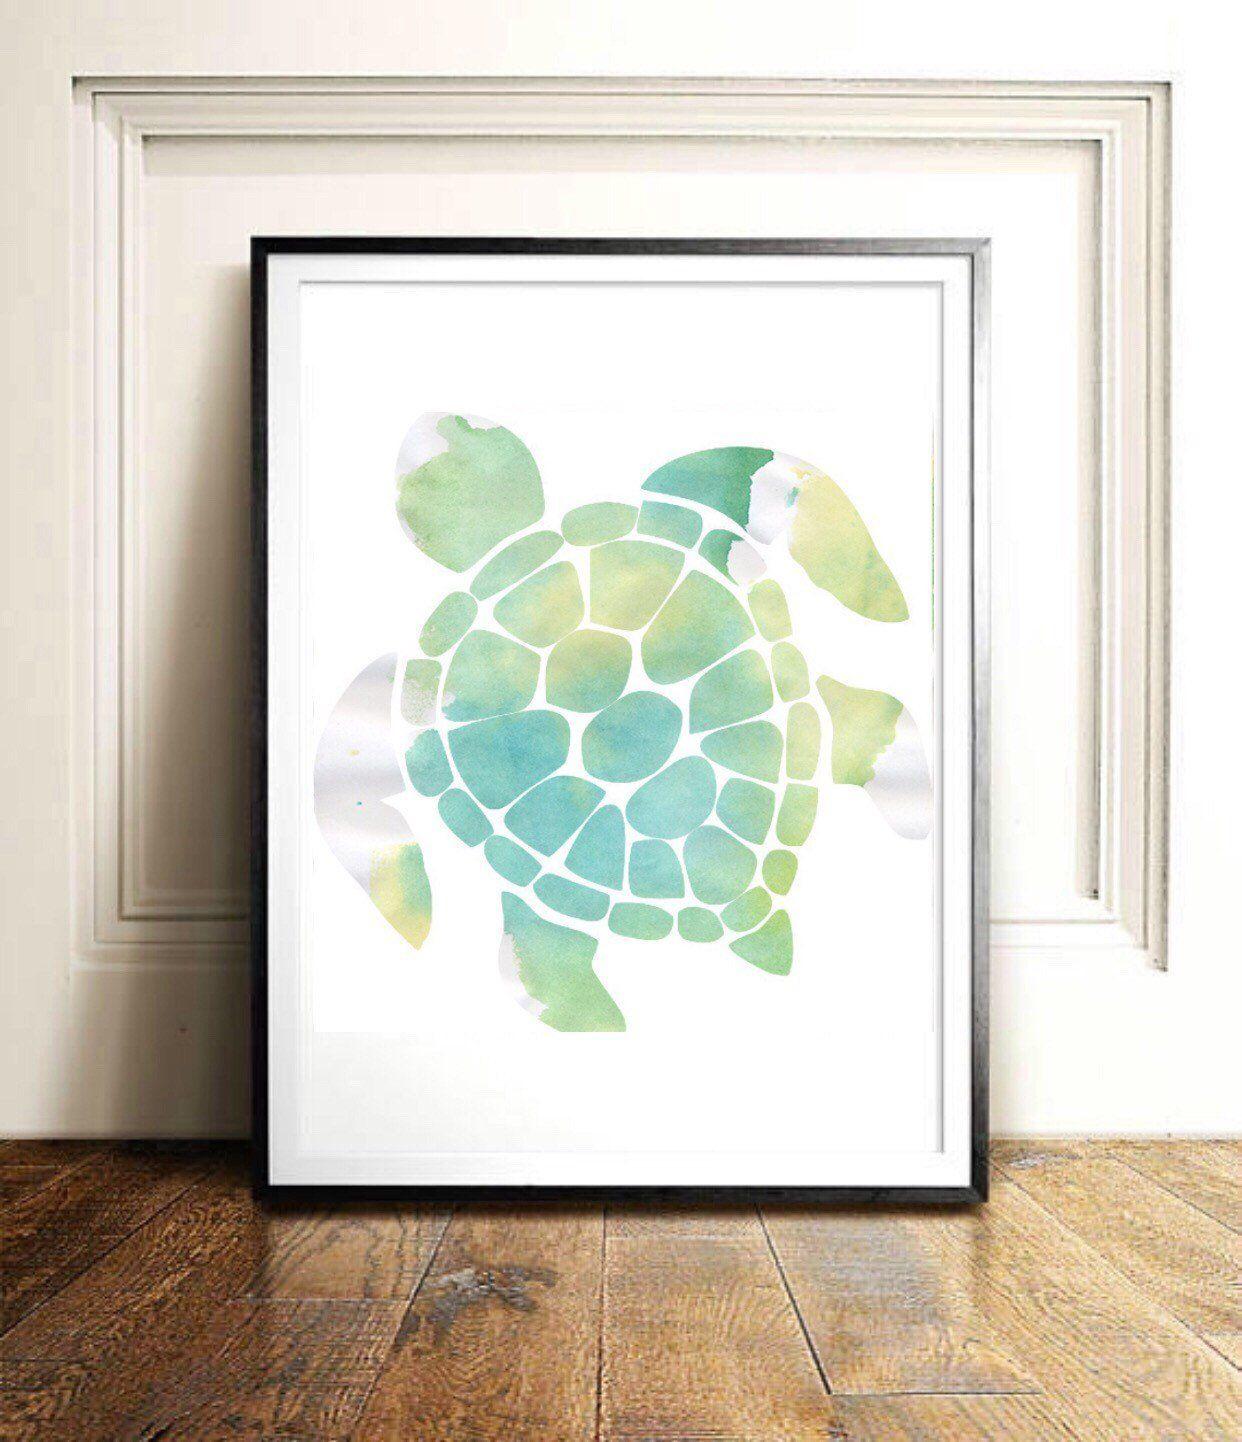 Magnificent Watercolor Turtle Beach Art Green Typographic Print Quote Download Free Architecture Designs Scobabritishbridgeorg